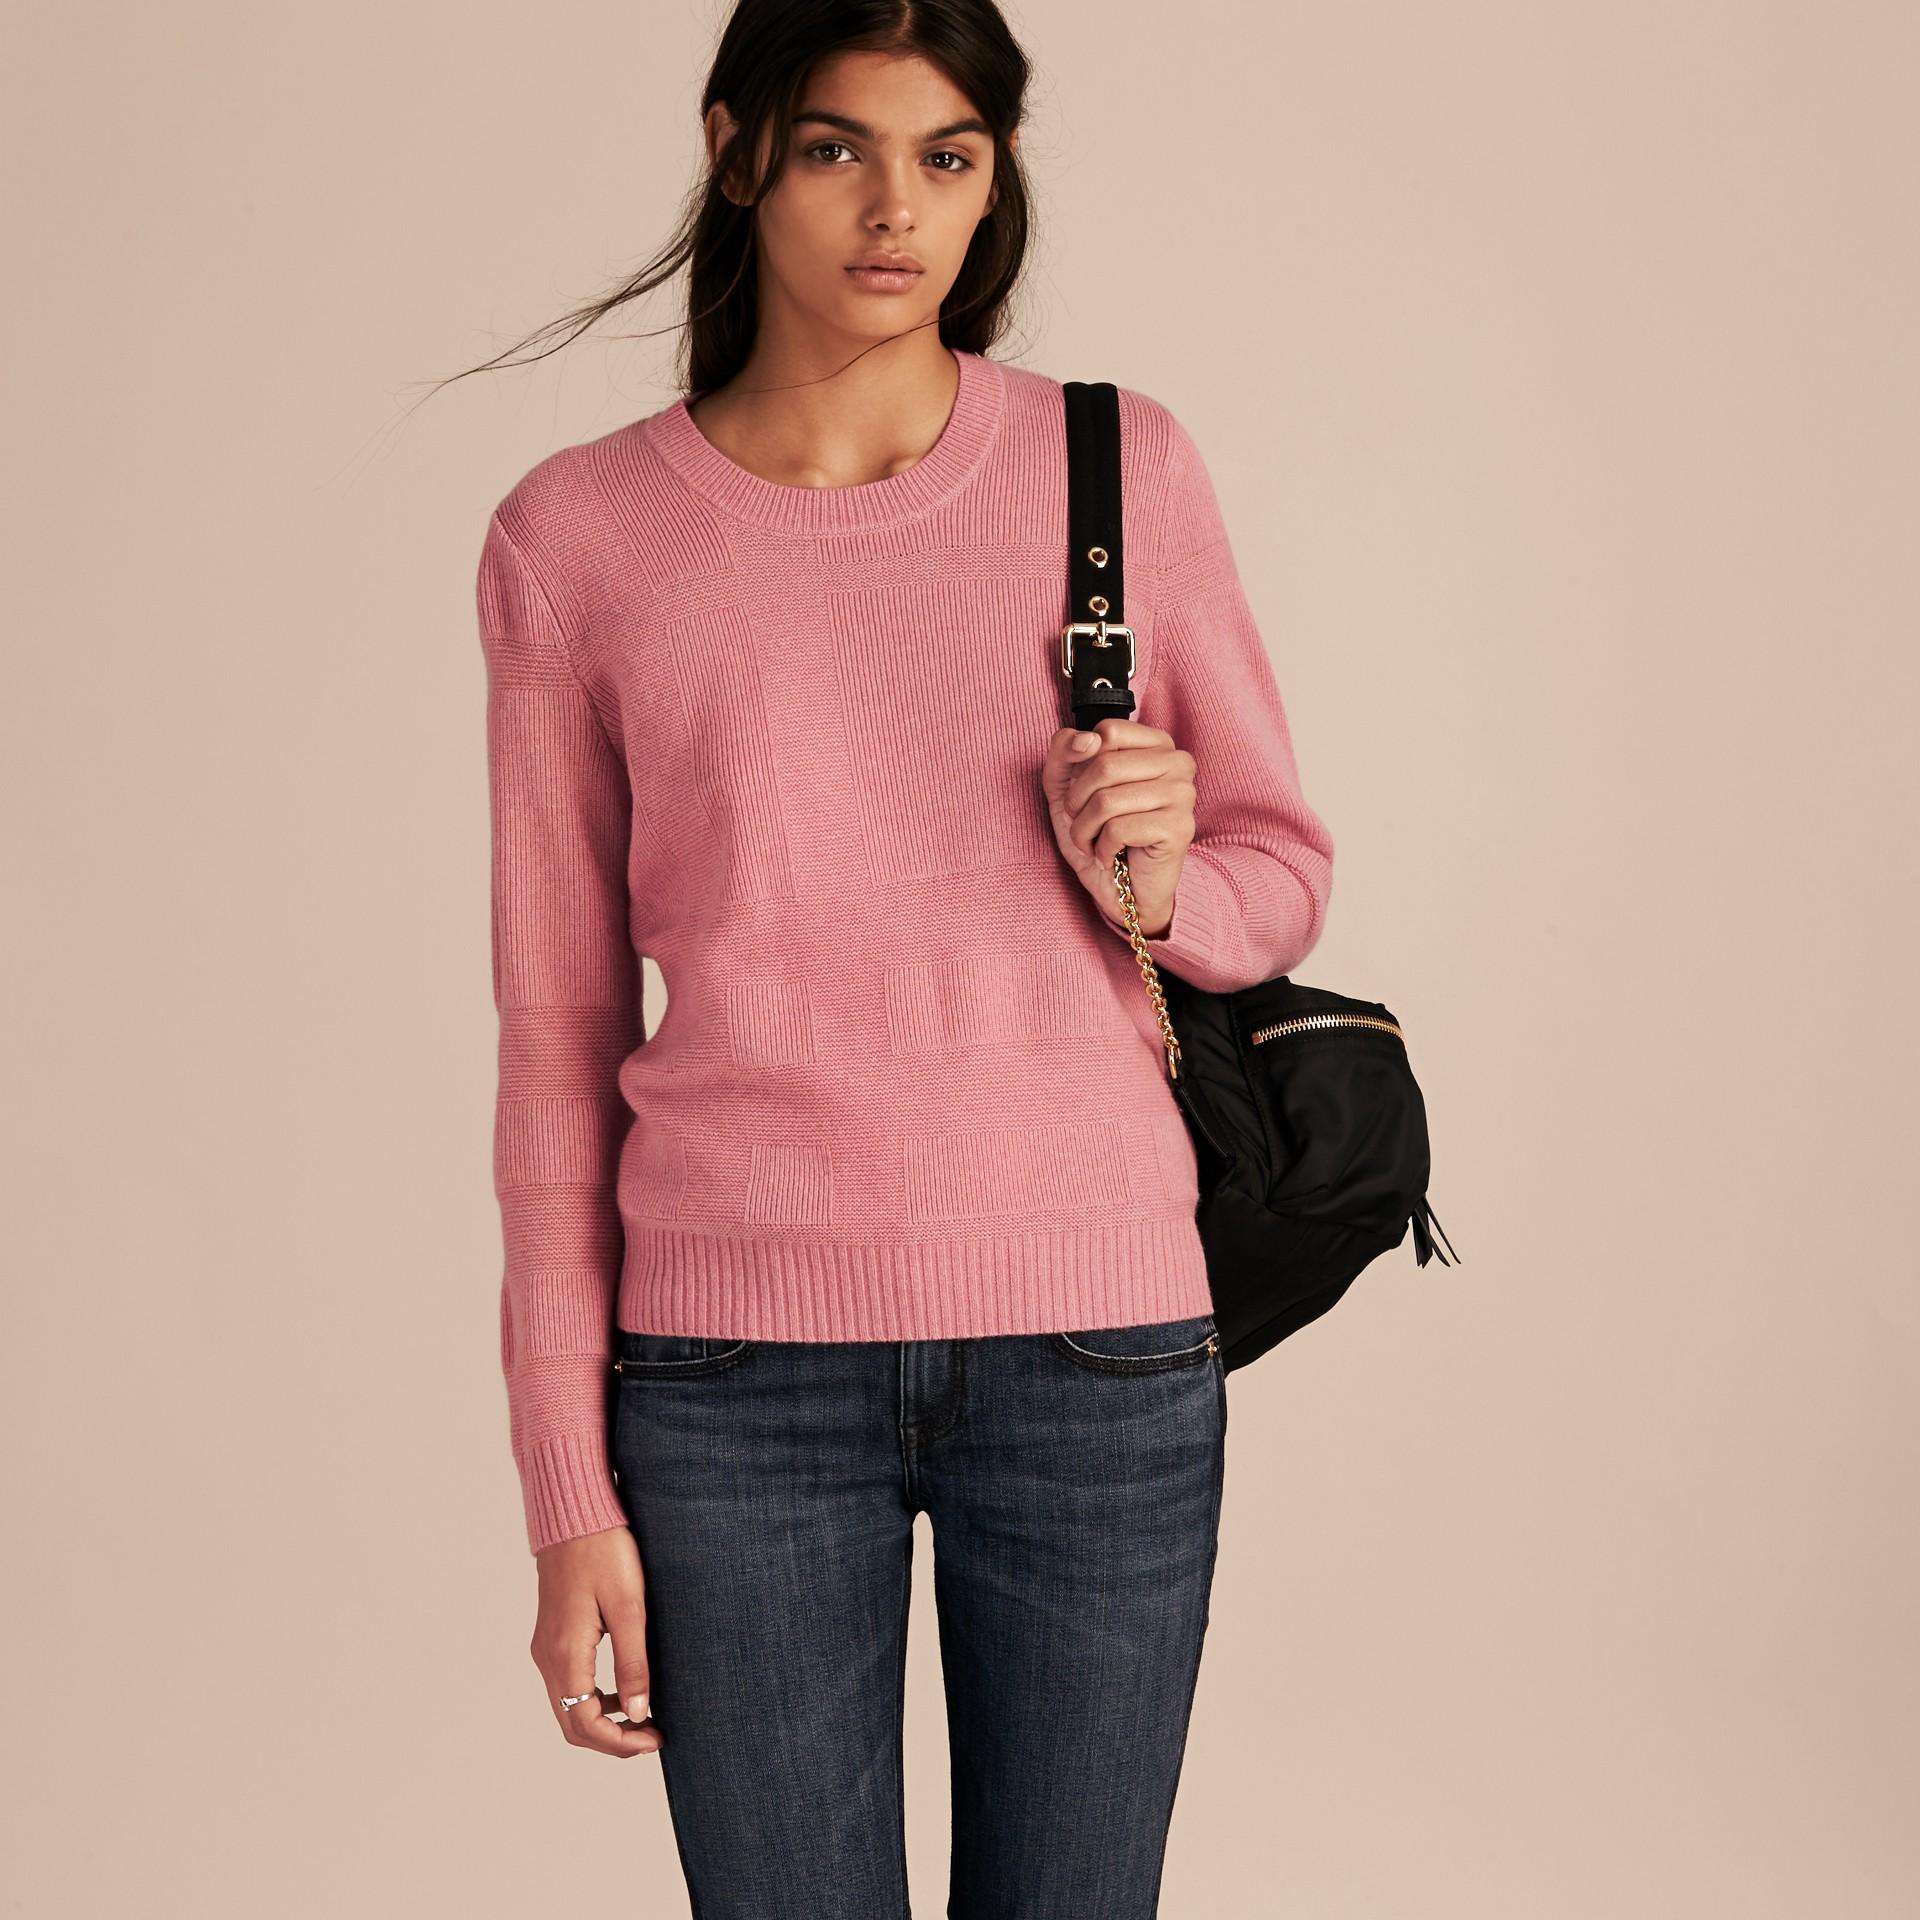 Hydrangea pink melange Check-knit Wool Cashmere Sweater Hydrangea Pink Melange - gallery image 6